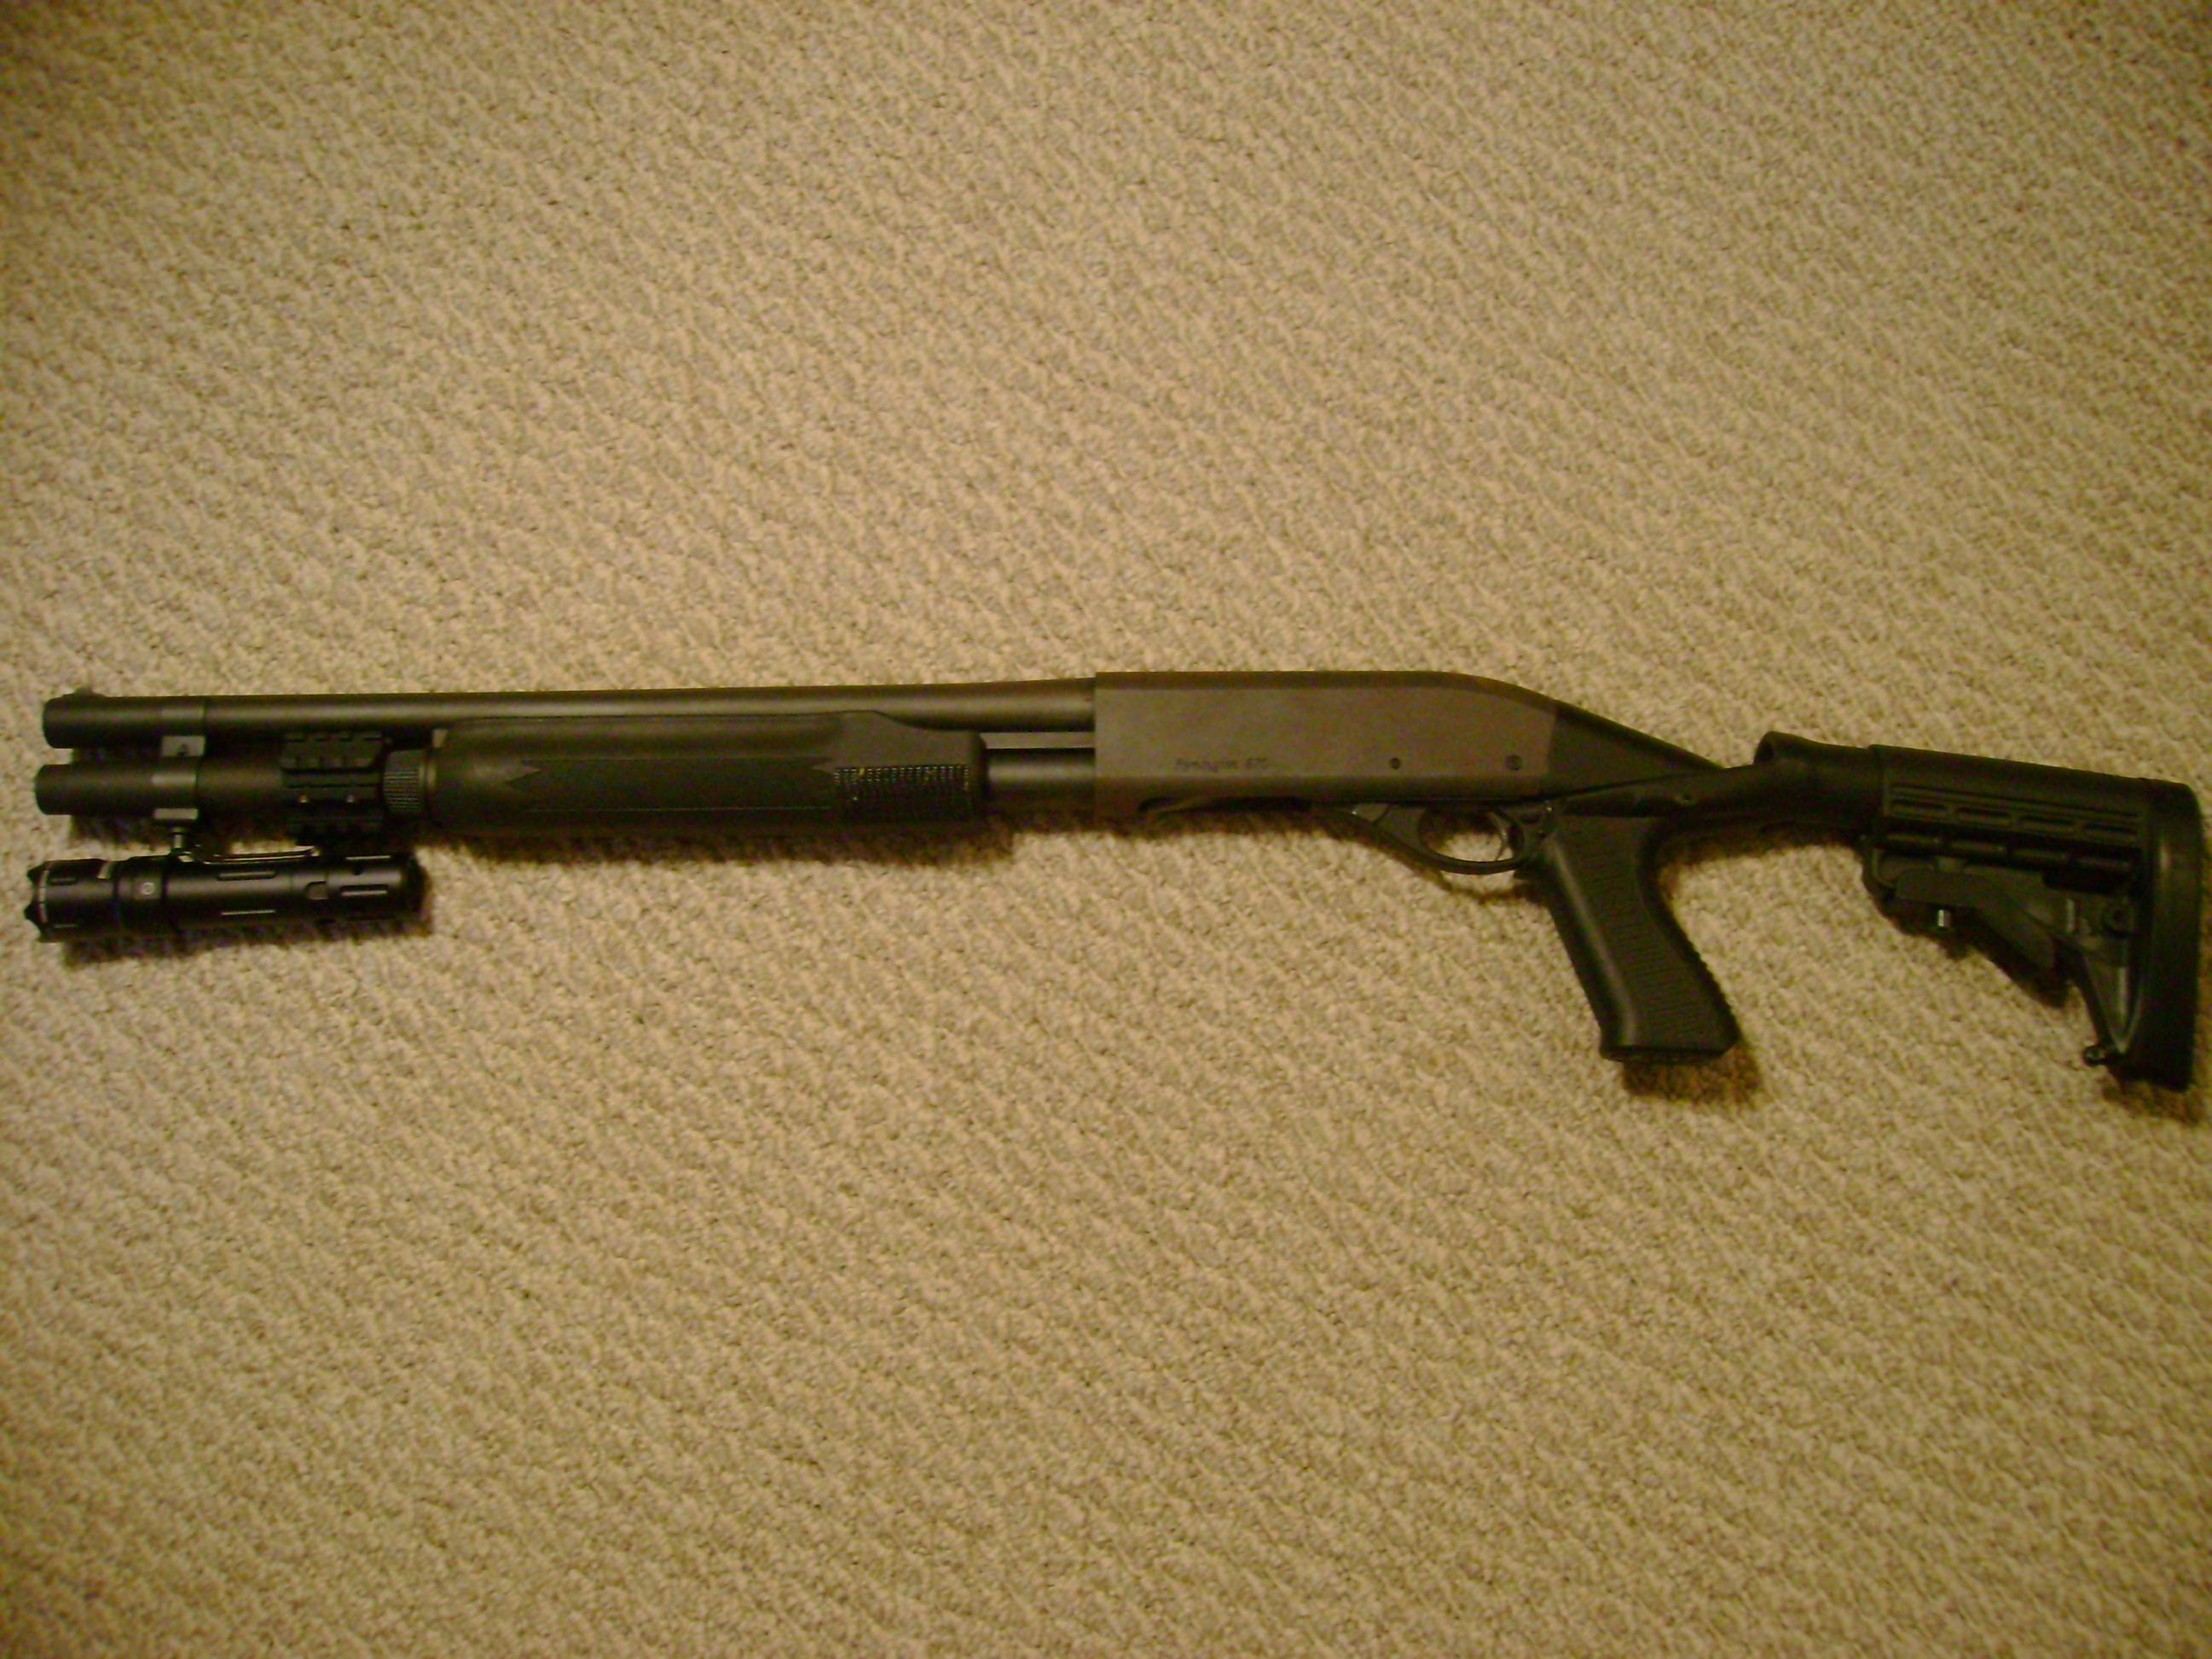 Shotgun for Home Defense-picture-003.jpg